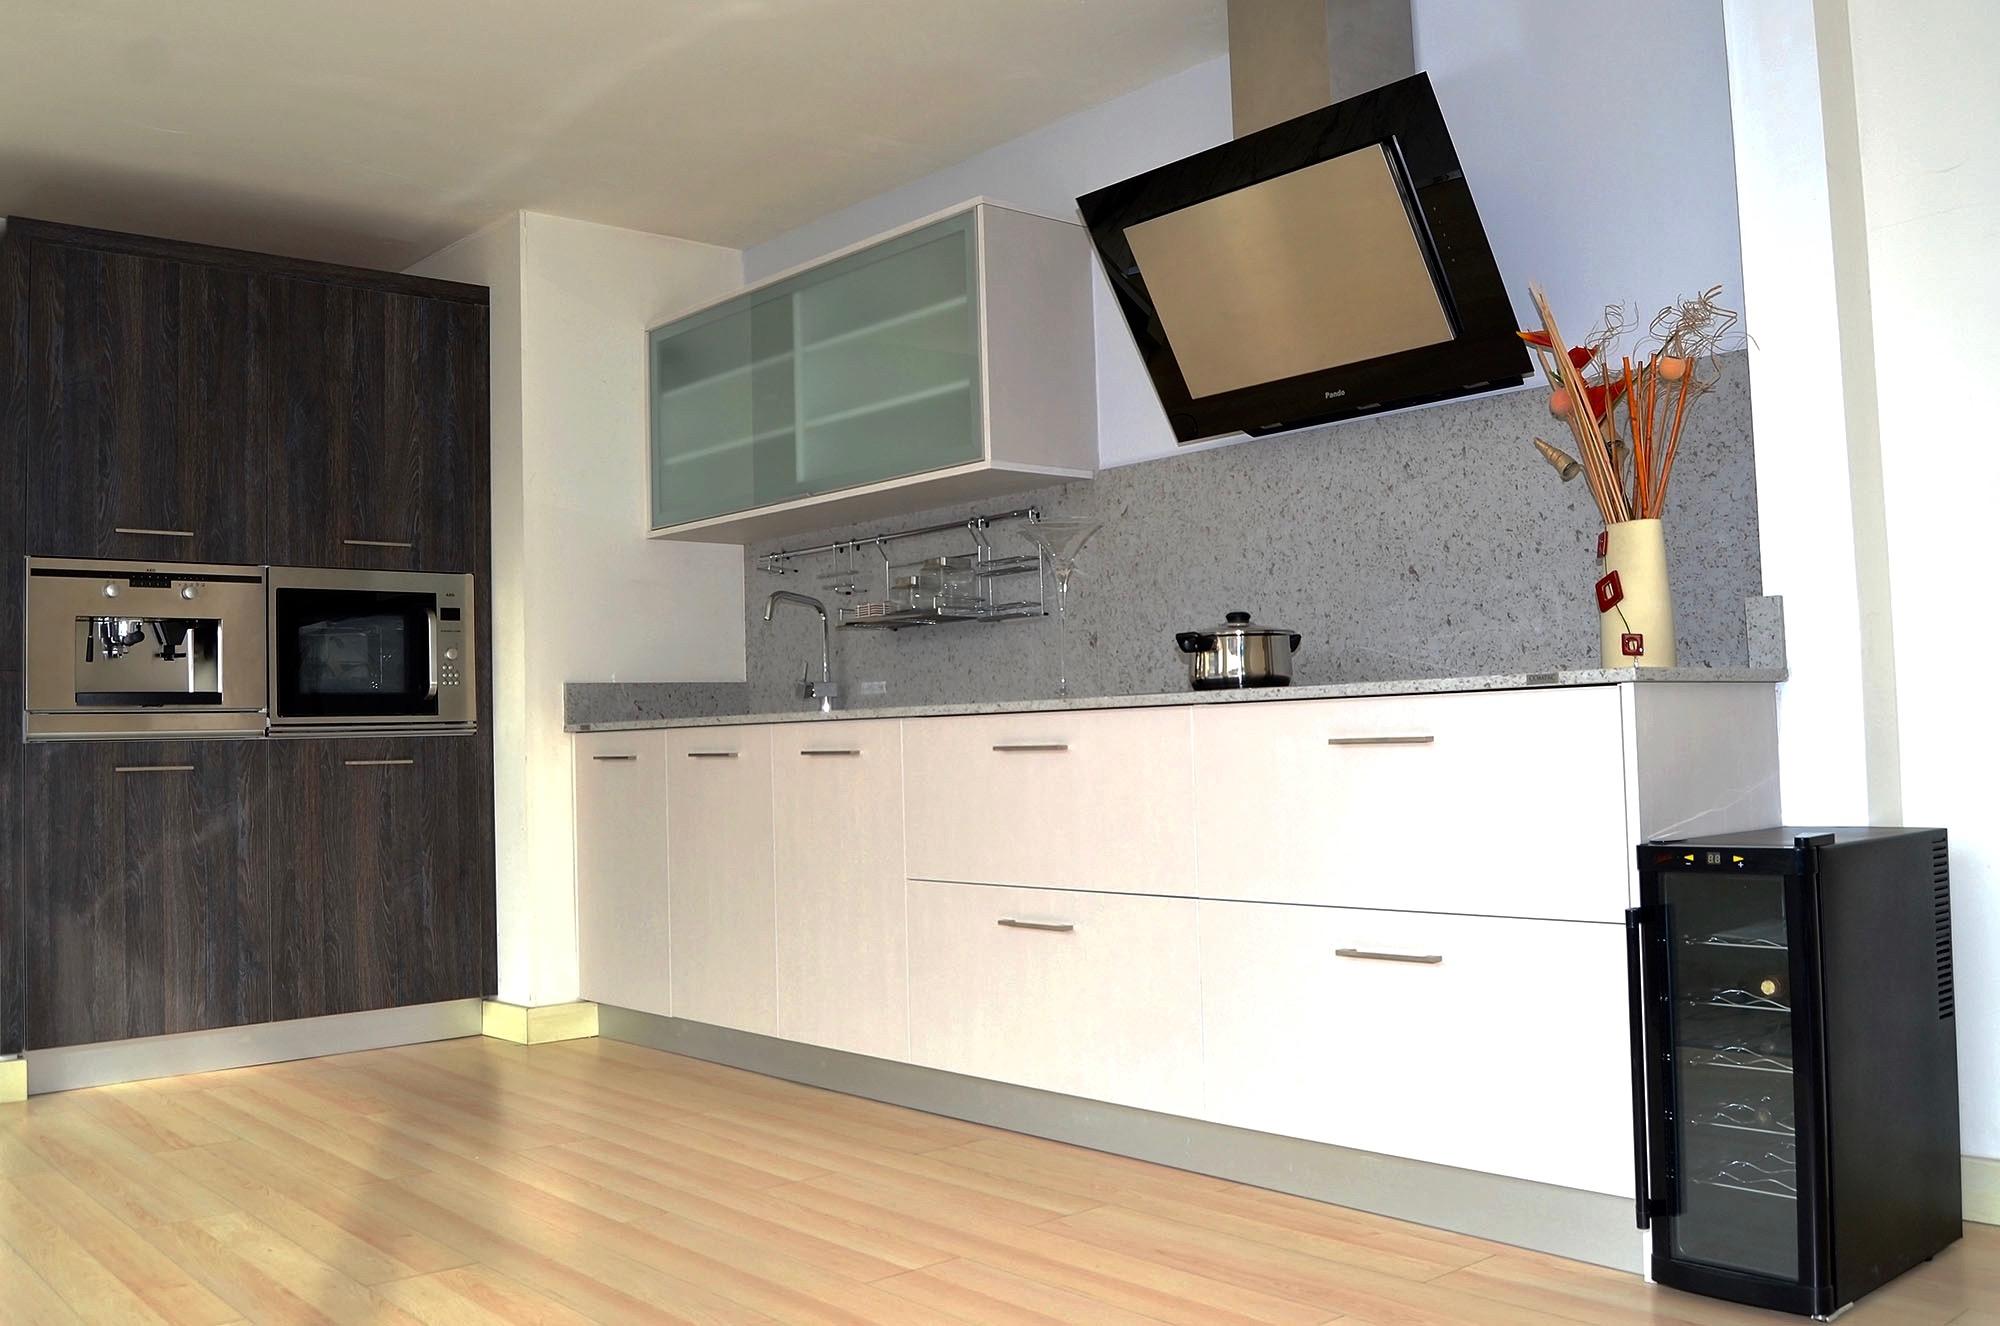 Catalogo muebles rojo santander 20170729092237 for Almacen para cocina